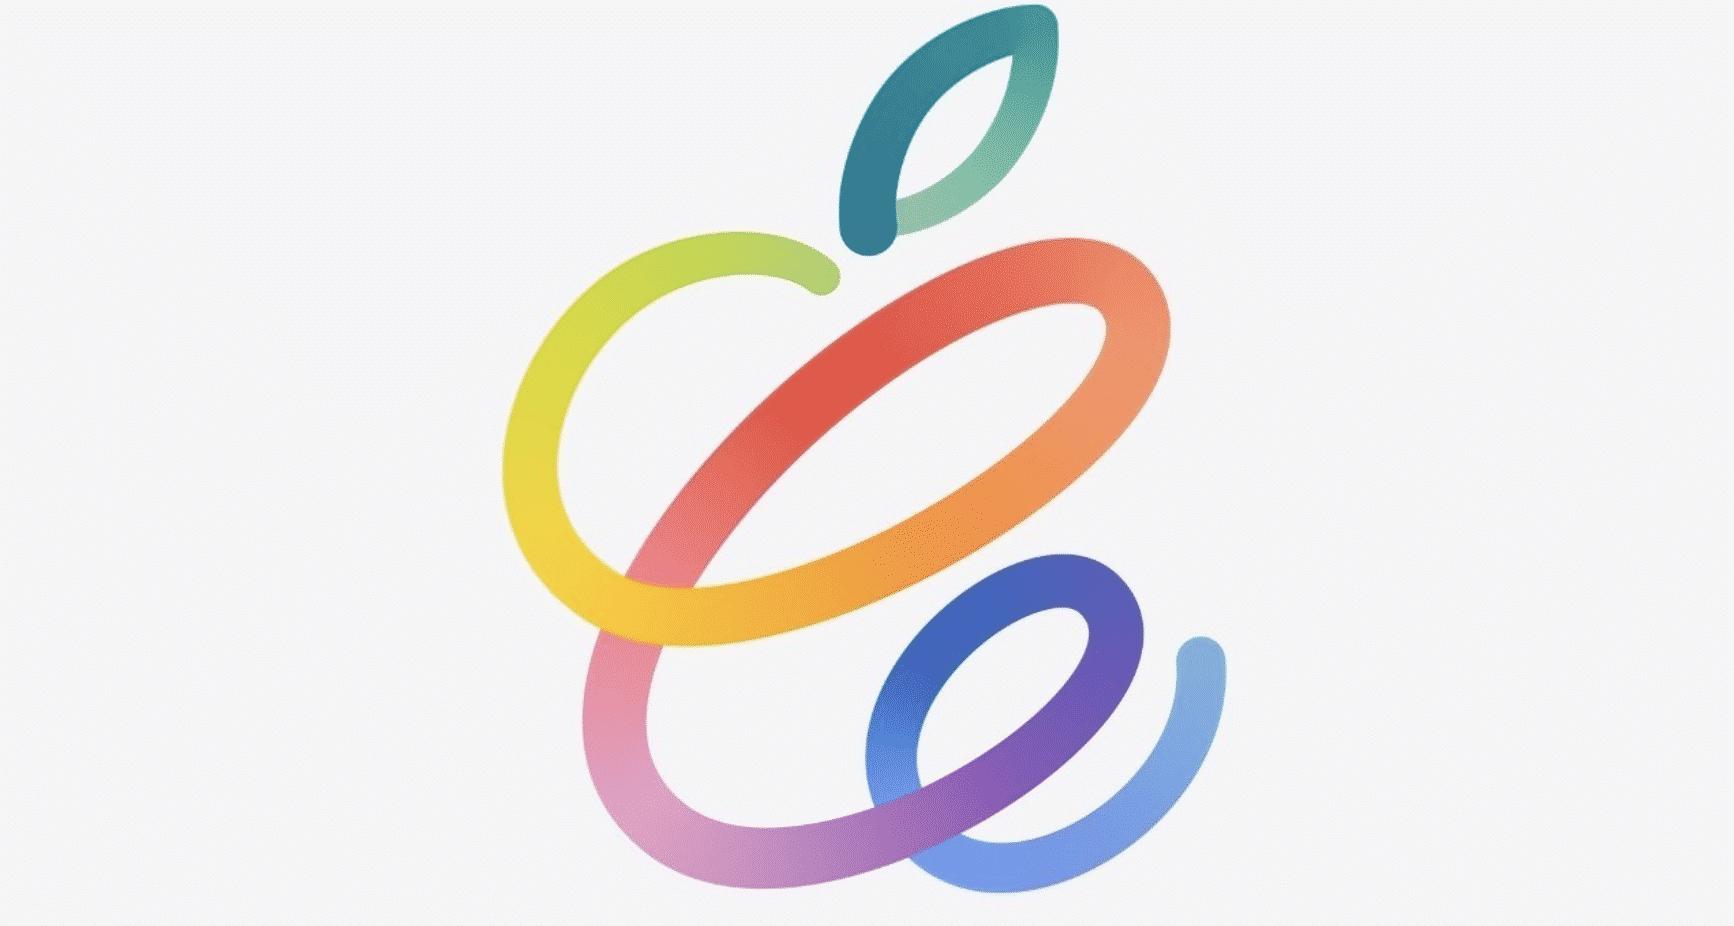 Apple's Spring